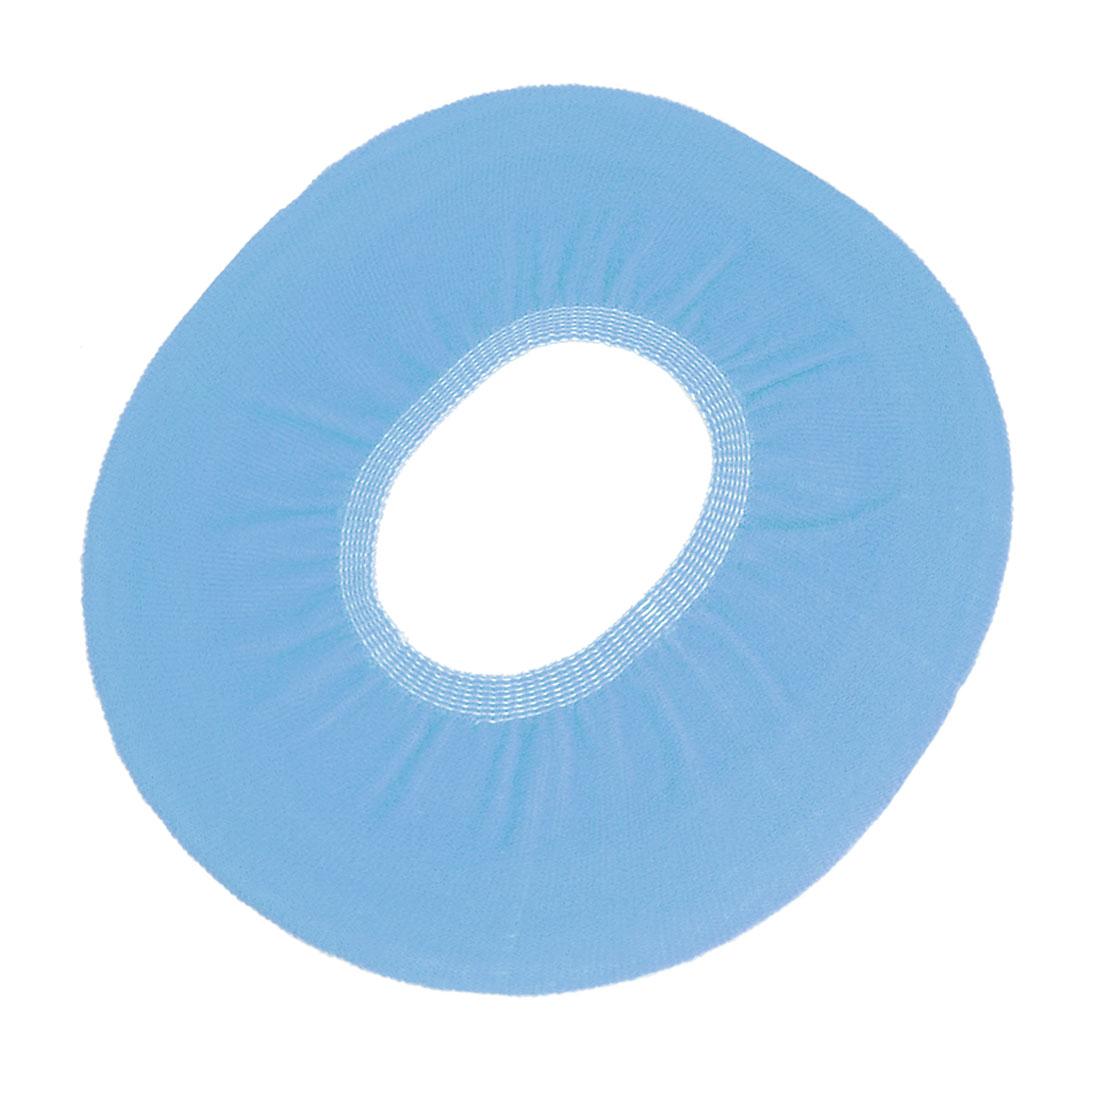 Bathroom Closestool Seat Lid Cover Warmer Fleece Pad Light Blue